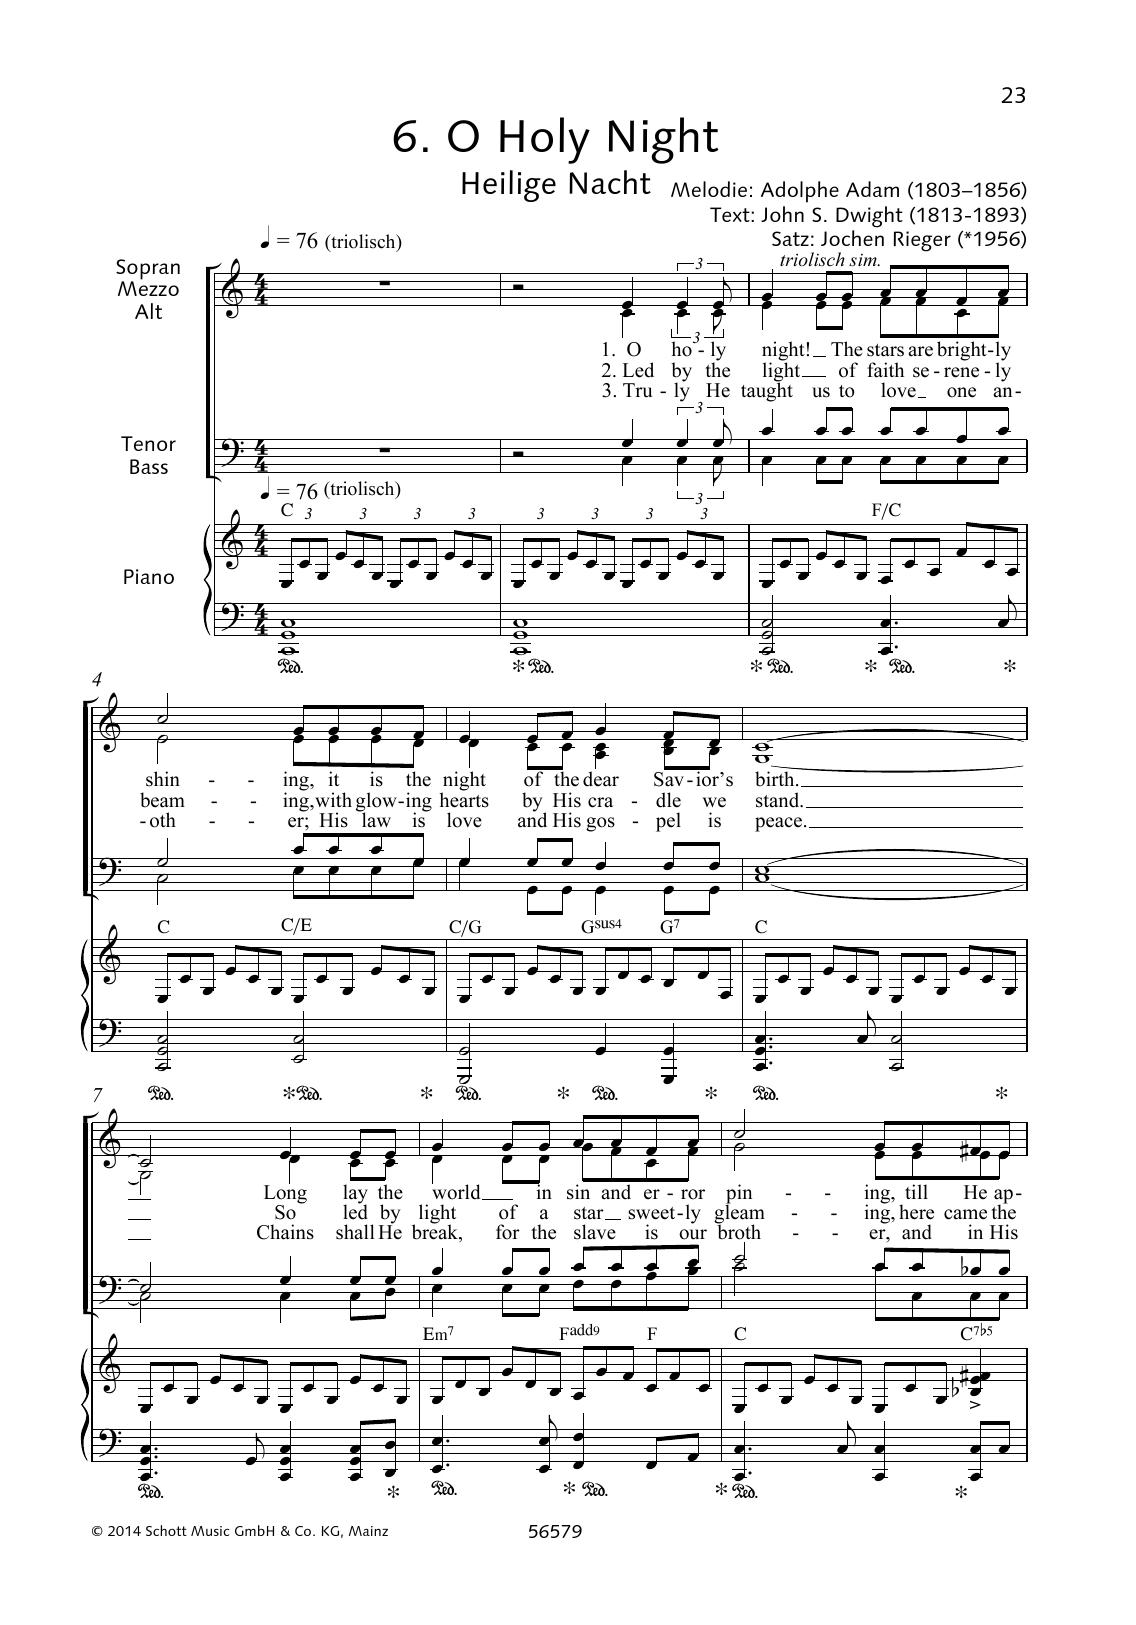 O Holy Night By Jochen Rieger Choral Digital Sheet Music